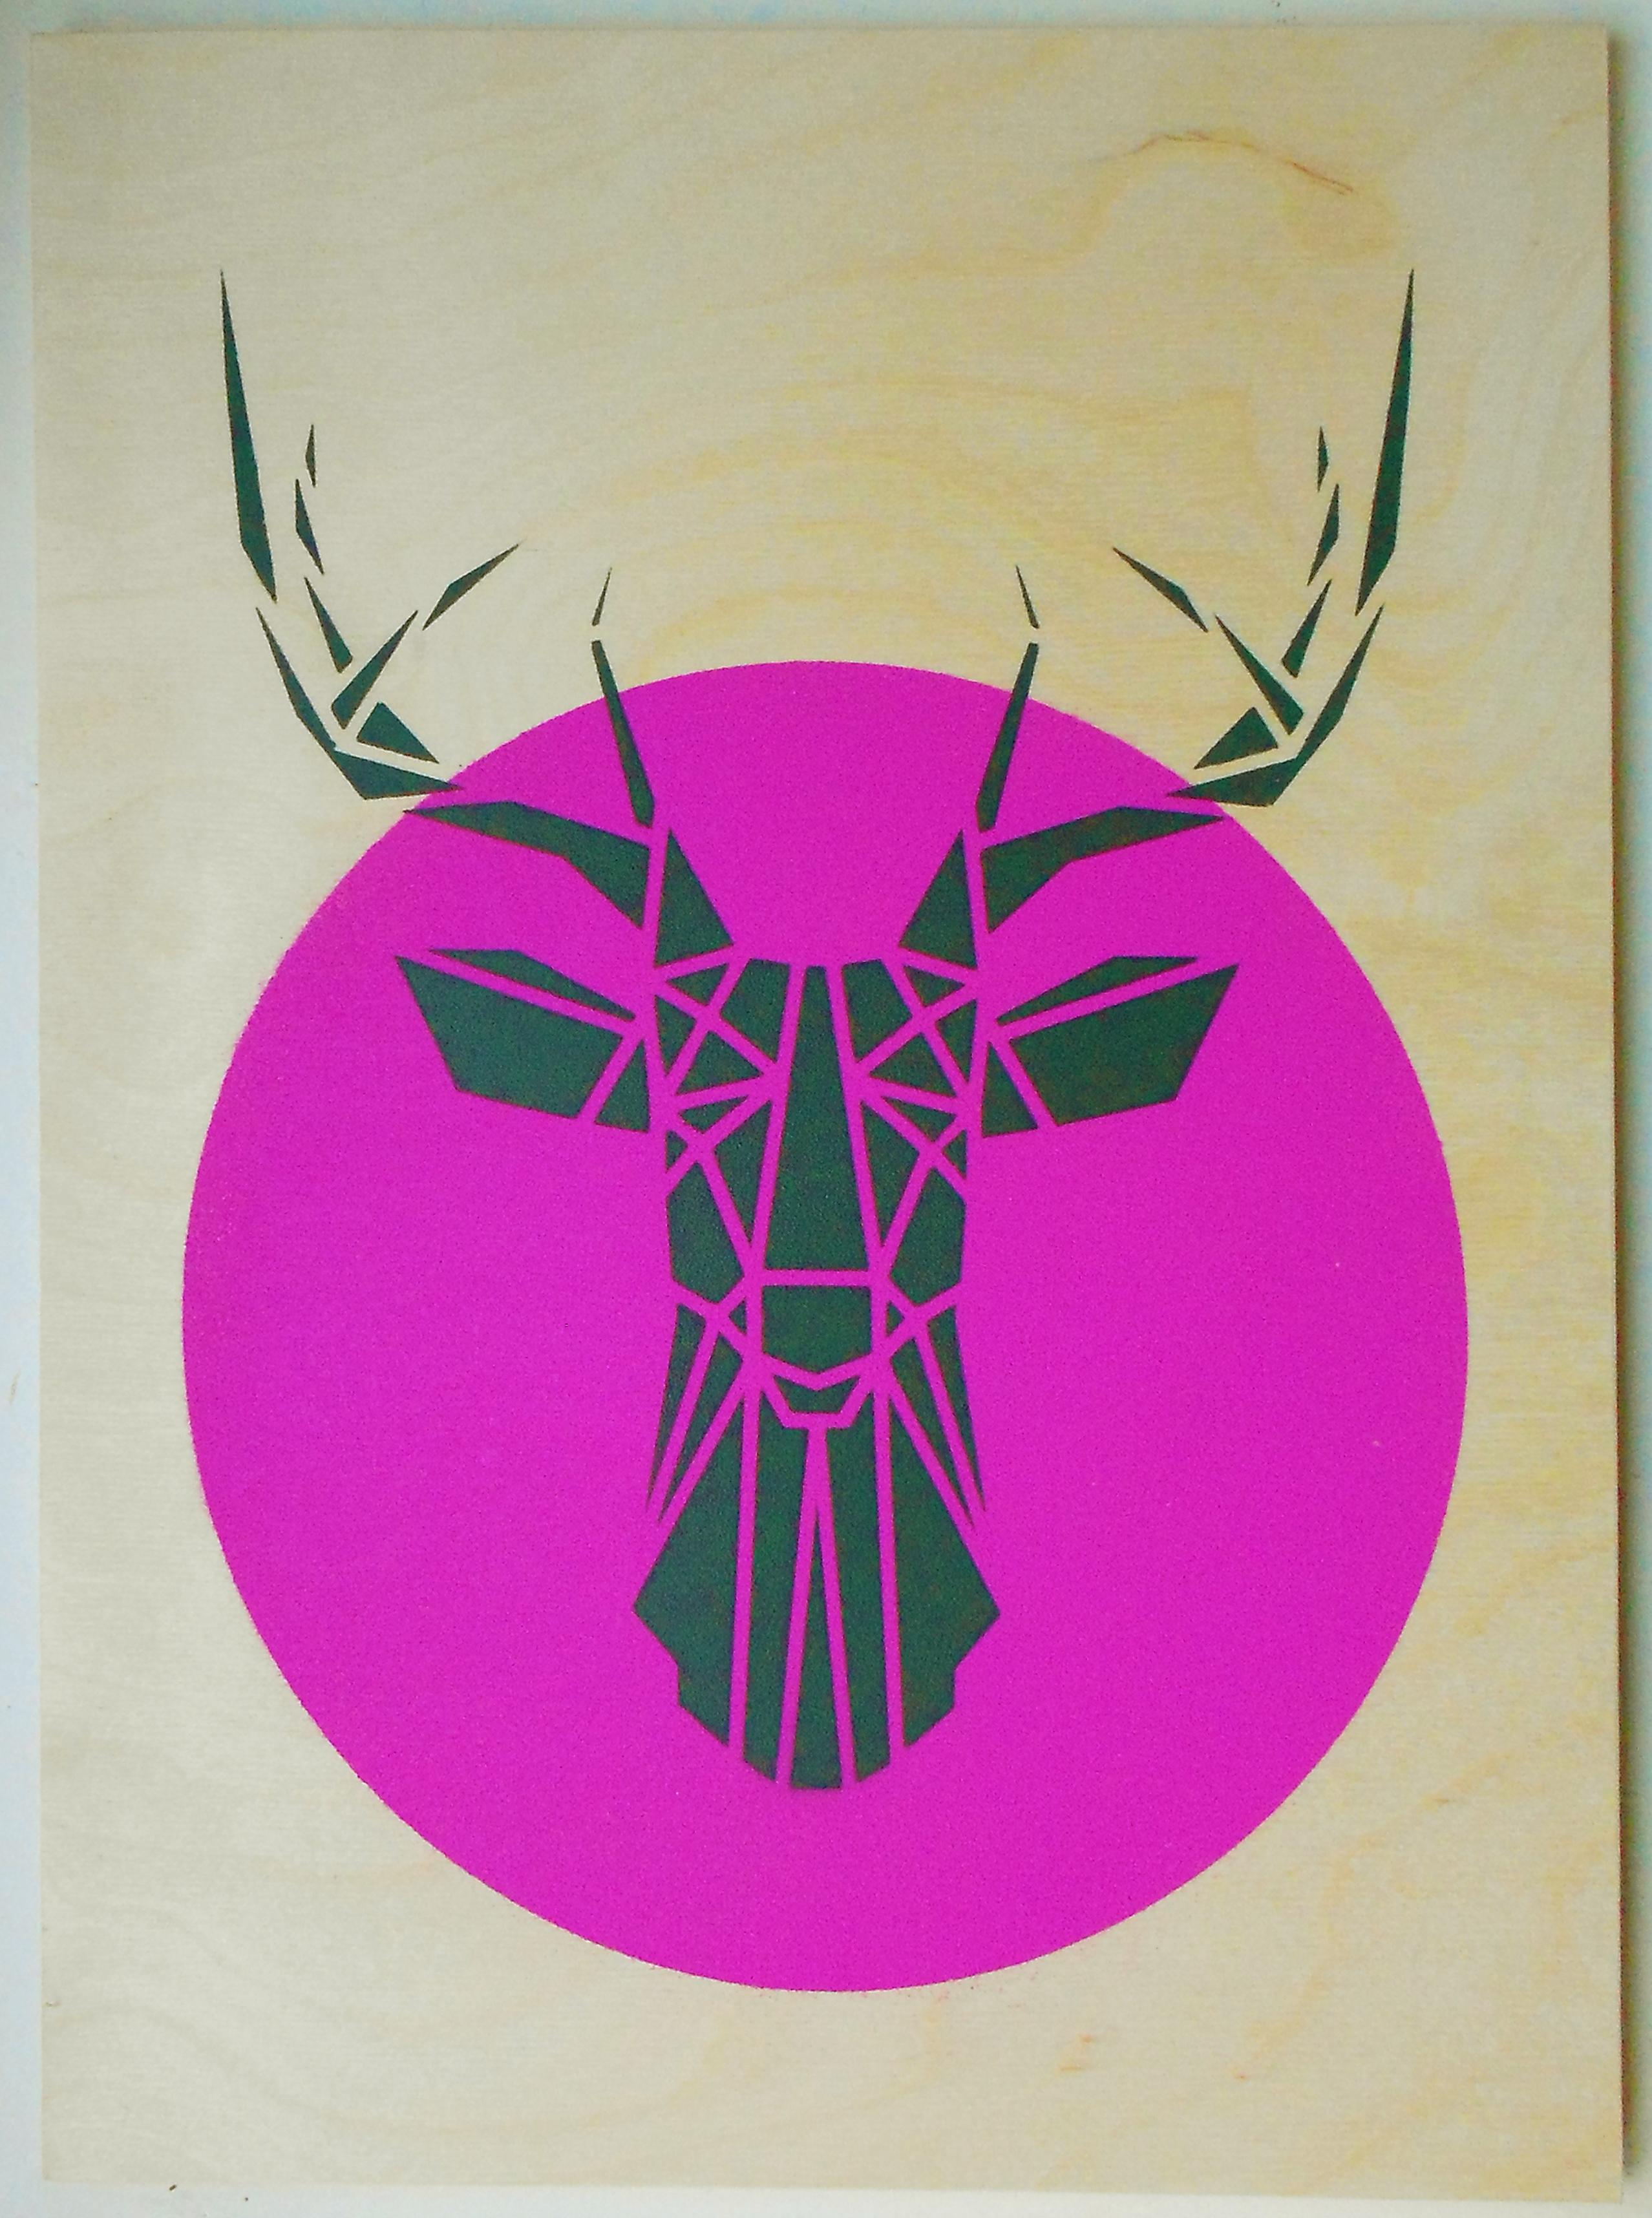 deer head logo pink - photo #16